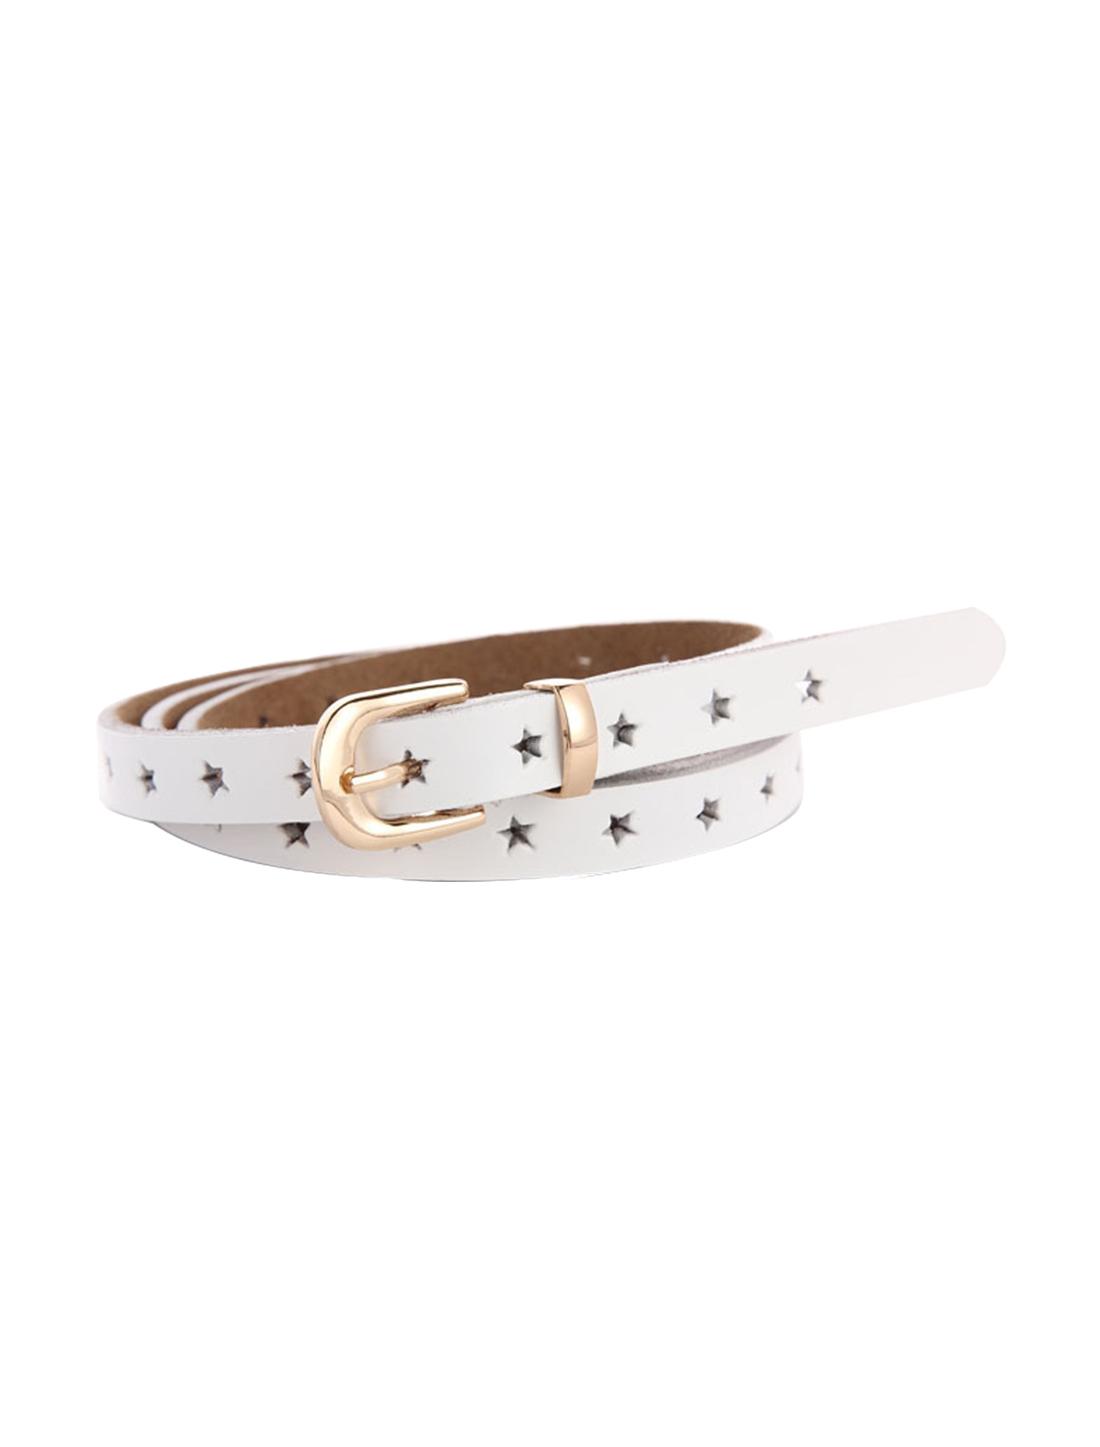 "Women Stars Hollow Alloy Pin Buckle Leather Skinny Belt Width 5/8"" White"